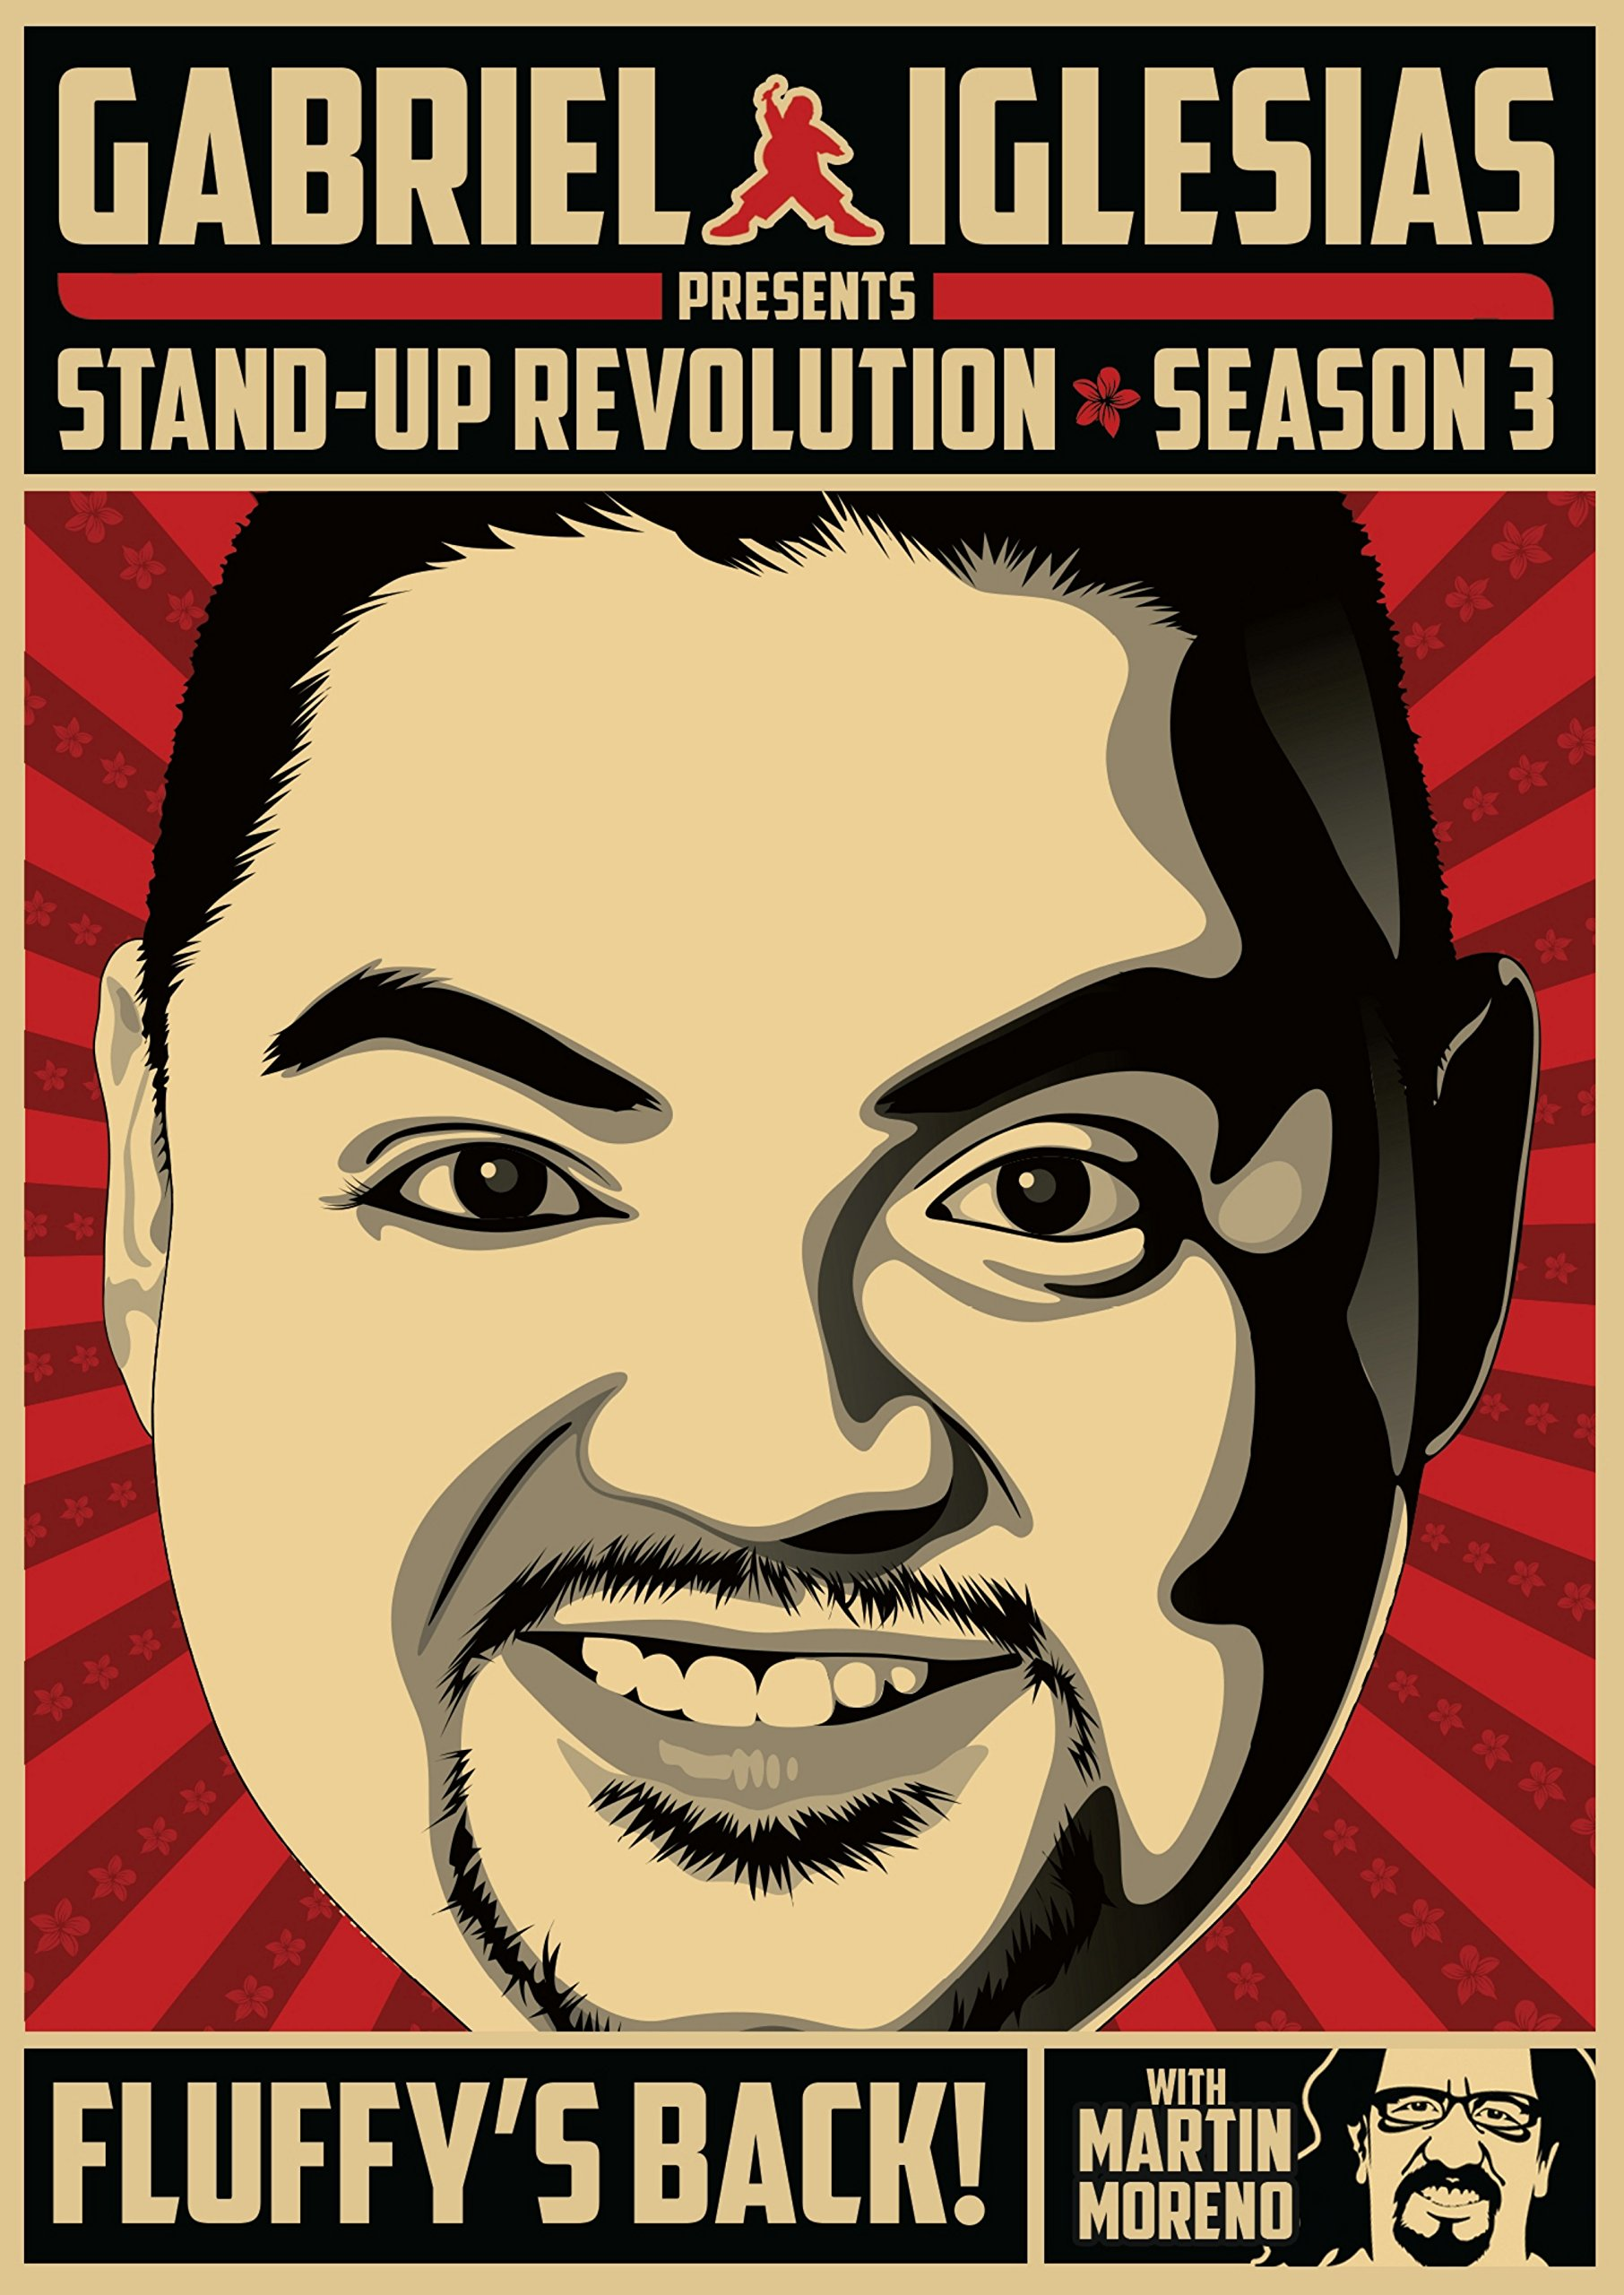 DVD : Gabriel Iglesias - Gabriel Iglesias Stand-up Revolution: Season Three (Widescreen, Subtitled, Dolby, Sensormatic)